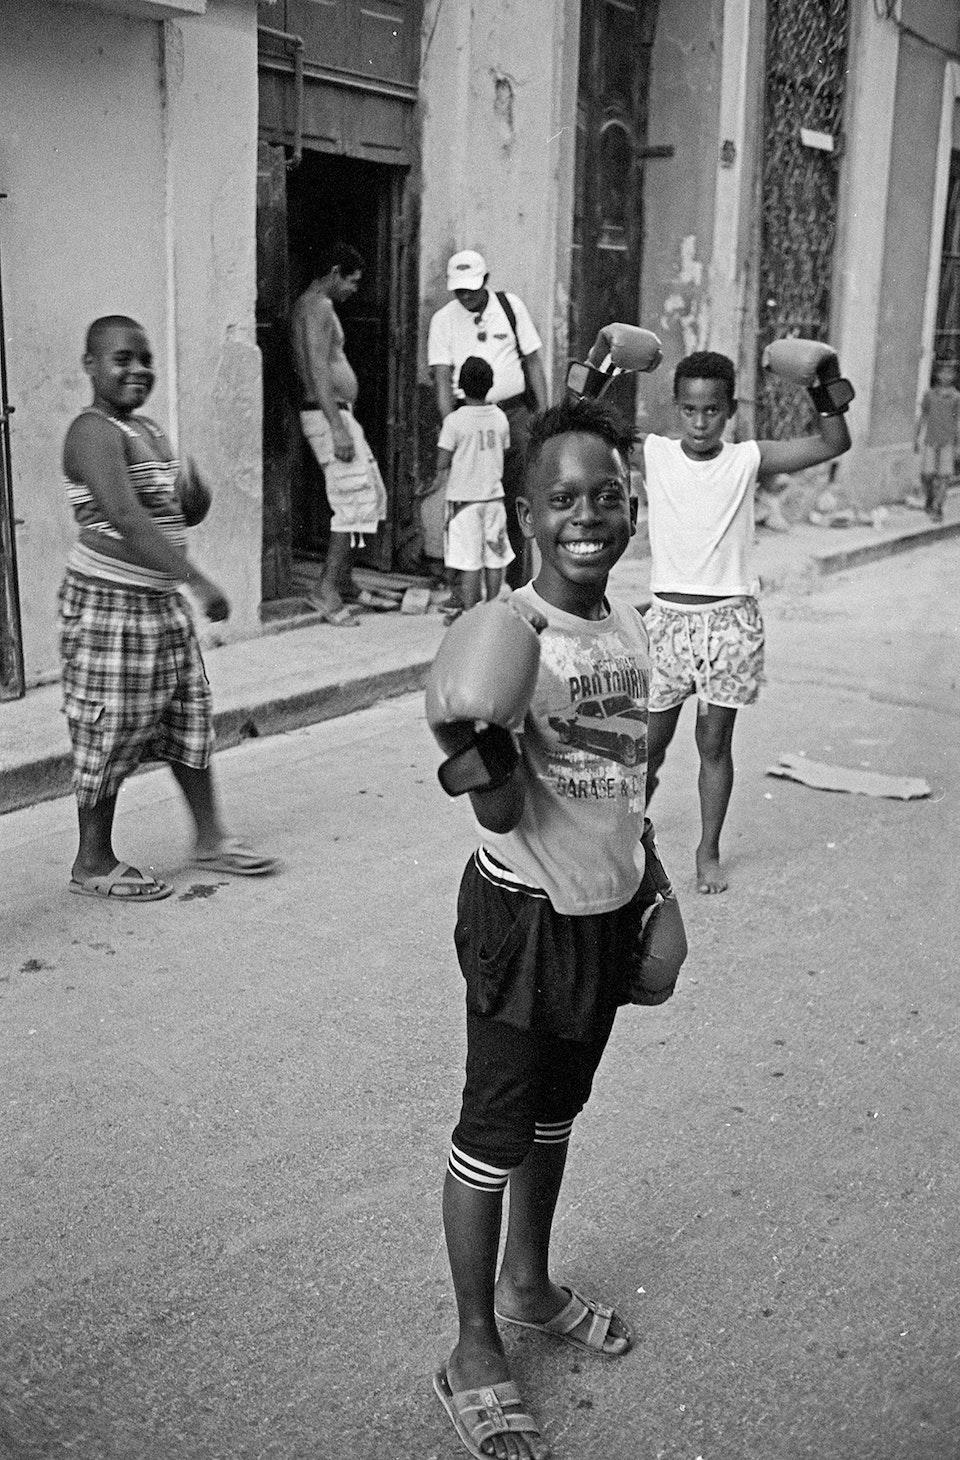 La Habana Cuba_kidsboxinwiner